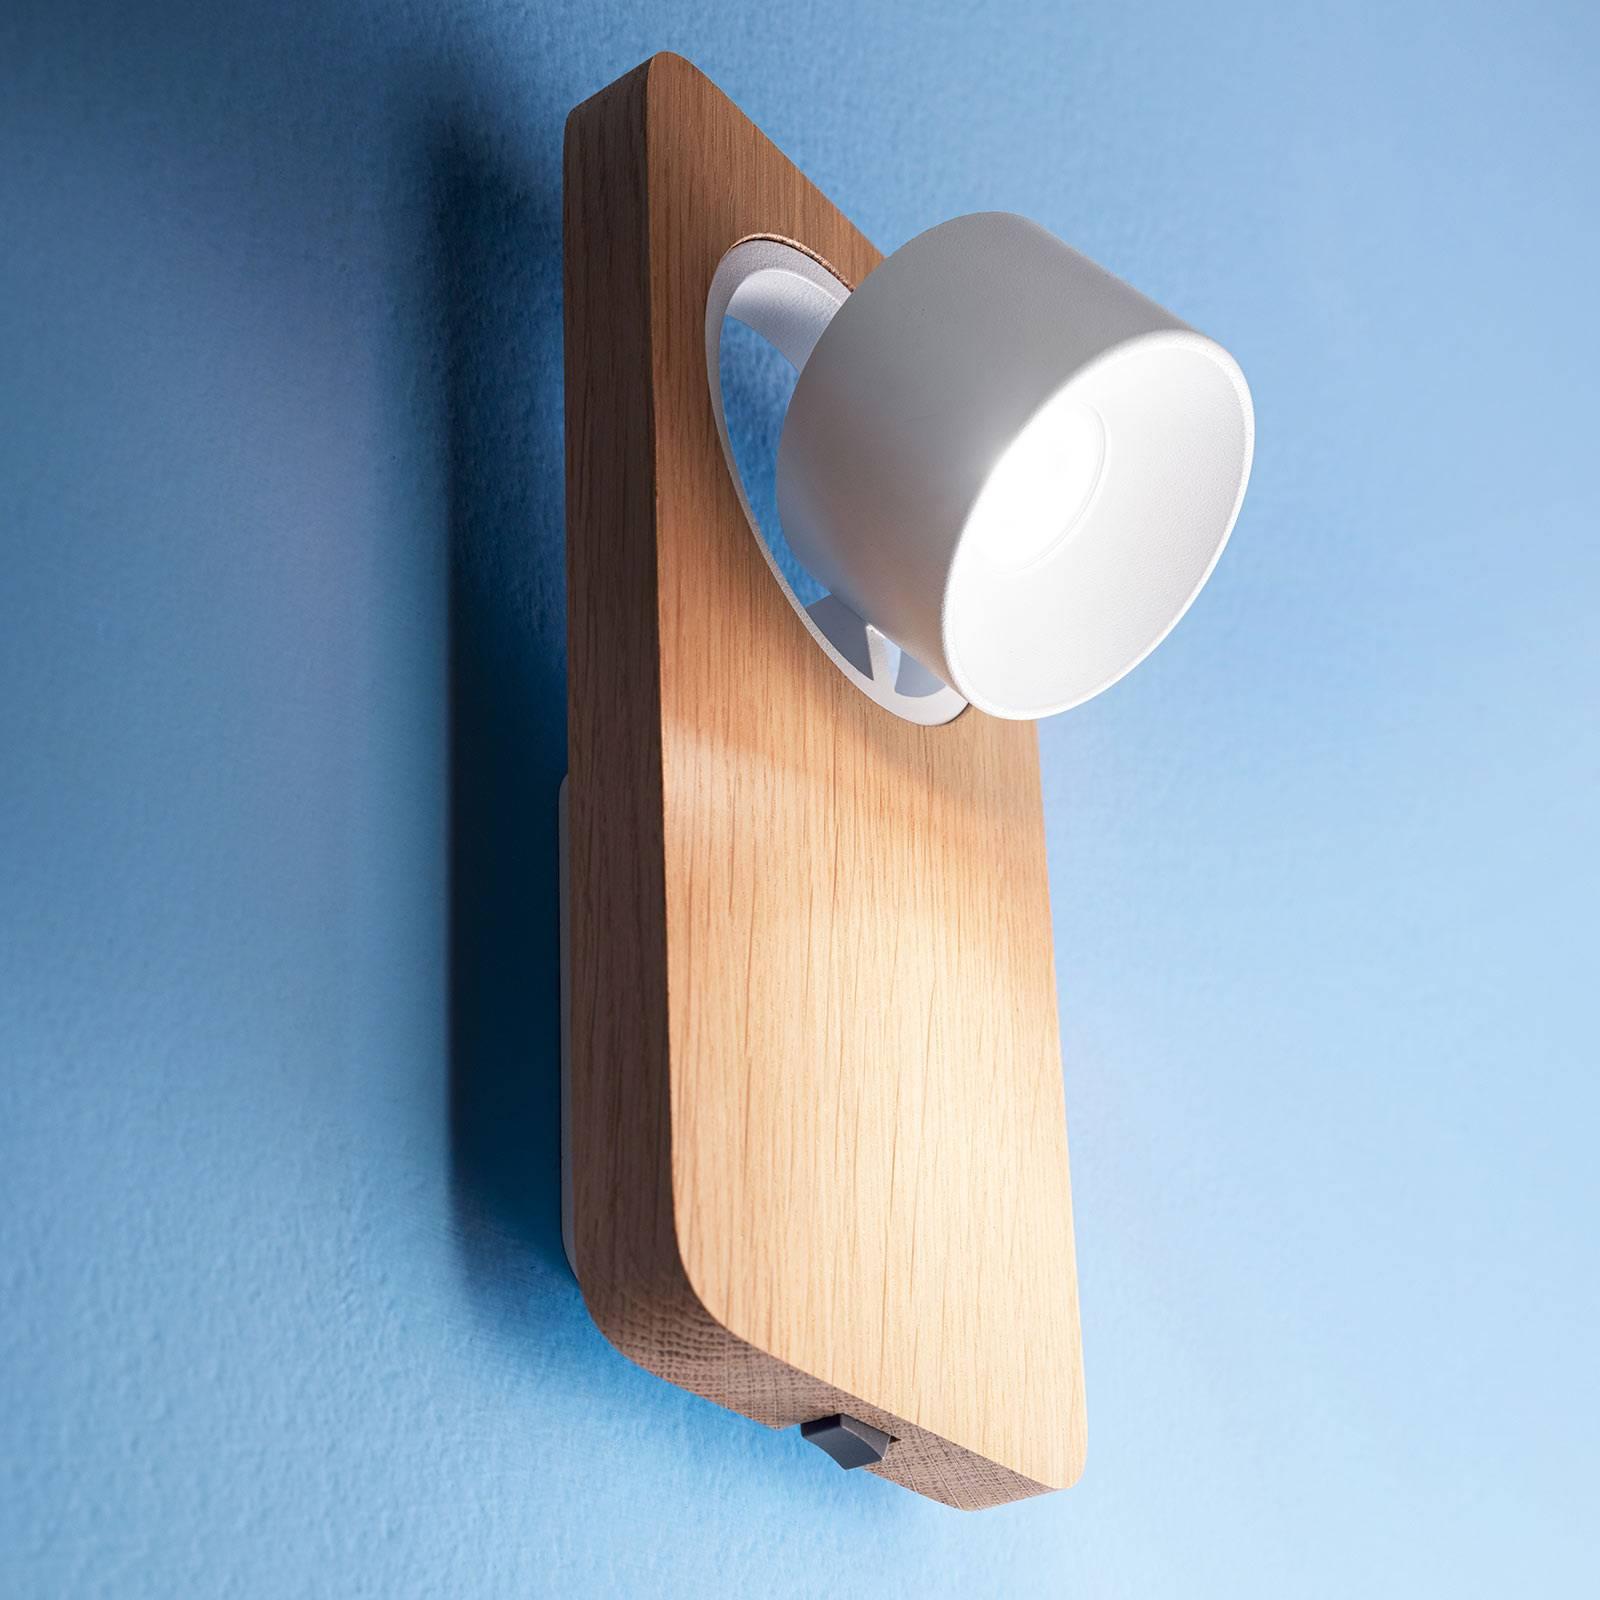 LED-Wandleuchte Beebo W, Eiche